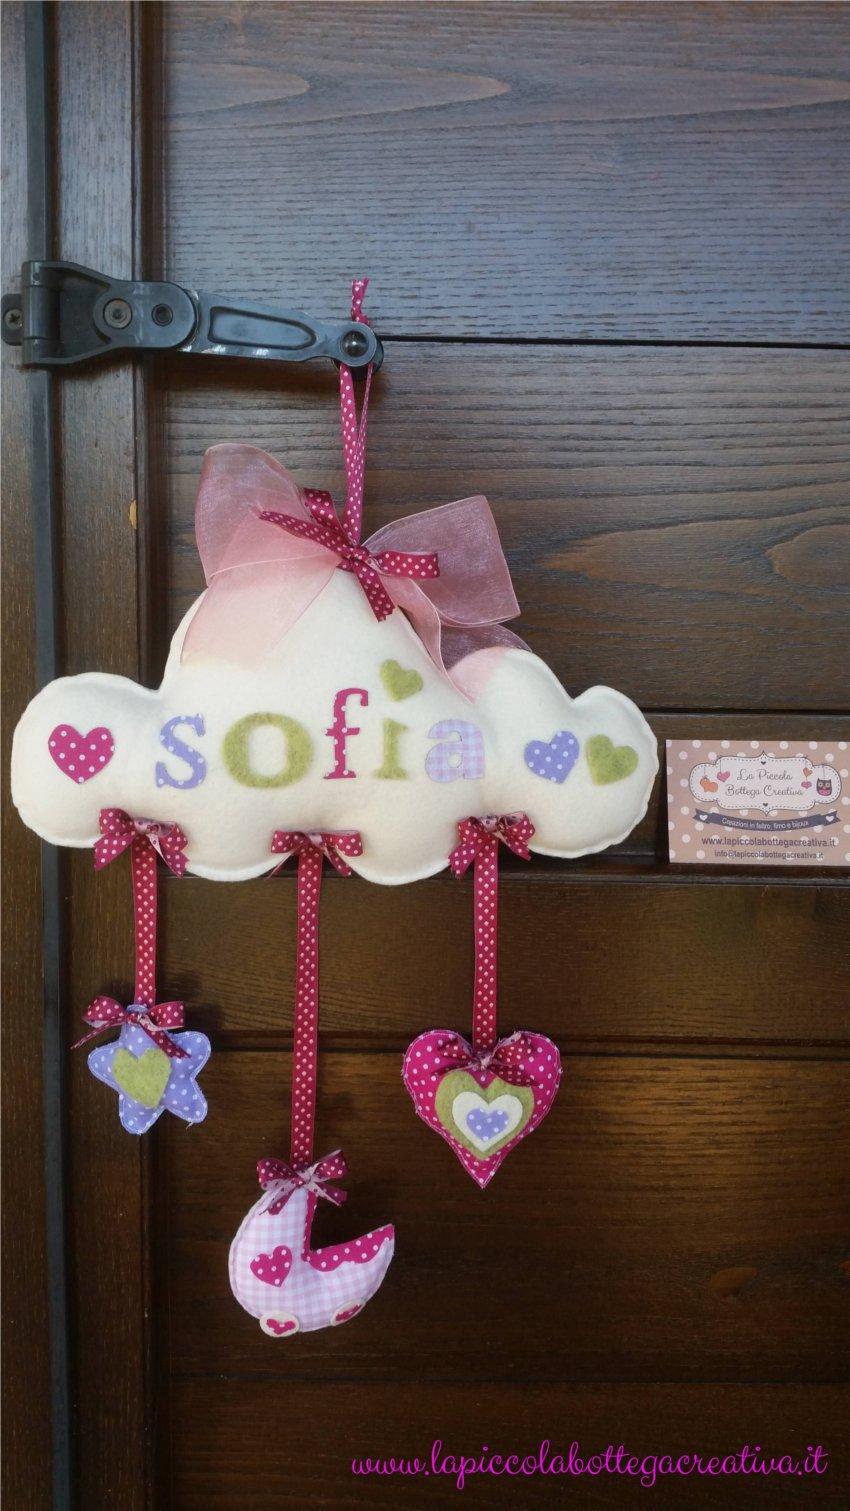 Bien-aimé Fiocco di nascita bimba - la piccola bottega creativa RM44